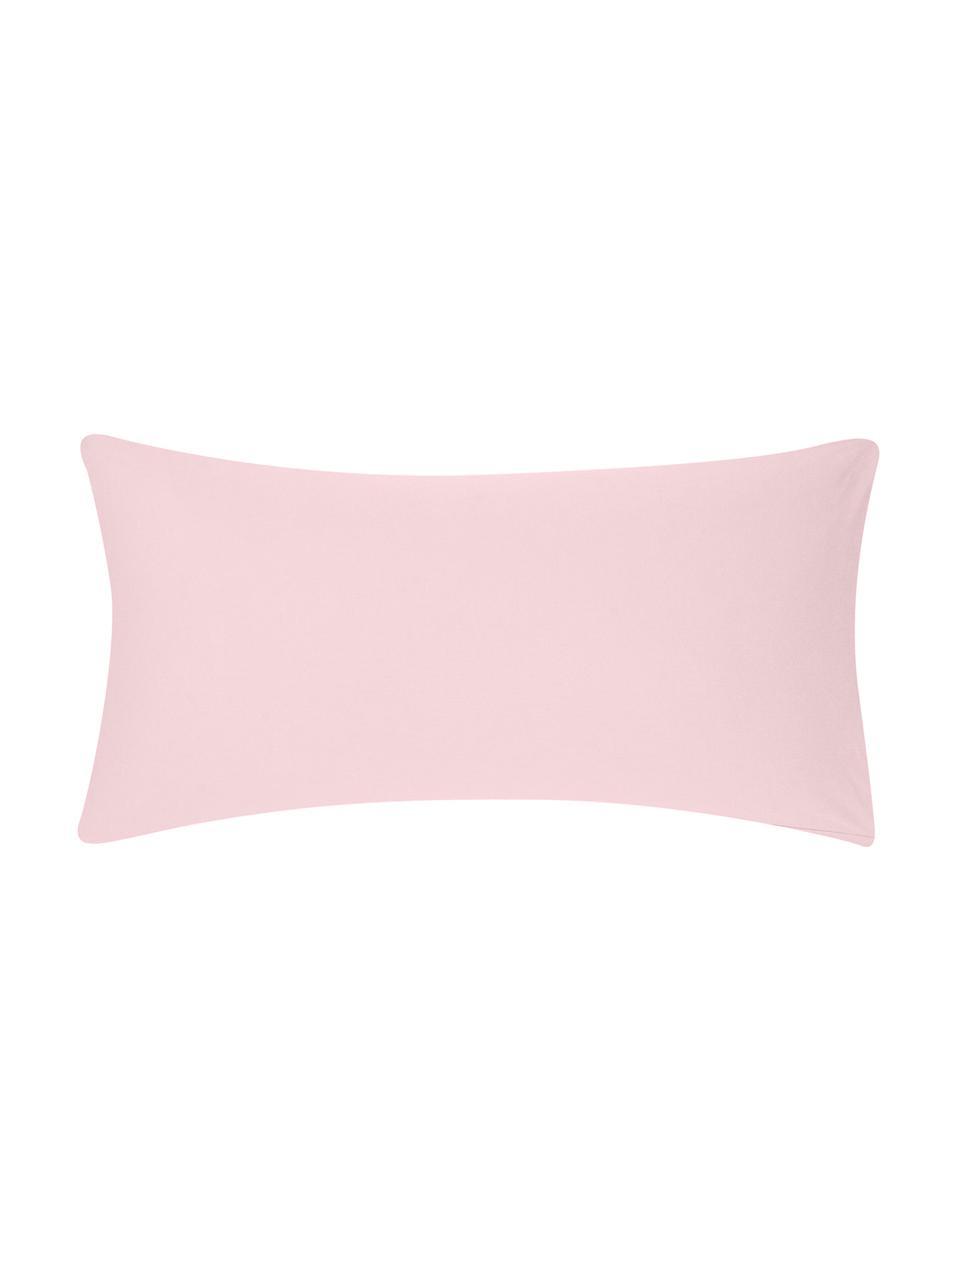 Flanell-Kissenbezüge Biba in Rosa, 2 Stück, Webart: Flanell Flanell ist ein k, Rosa, 40 x 80 cm